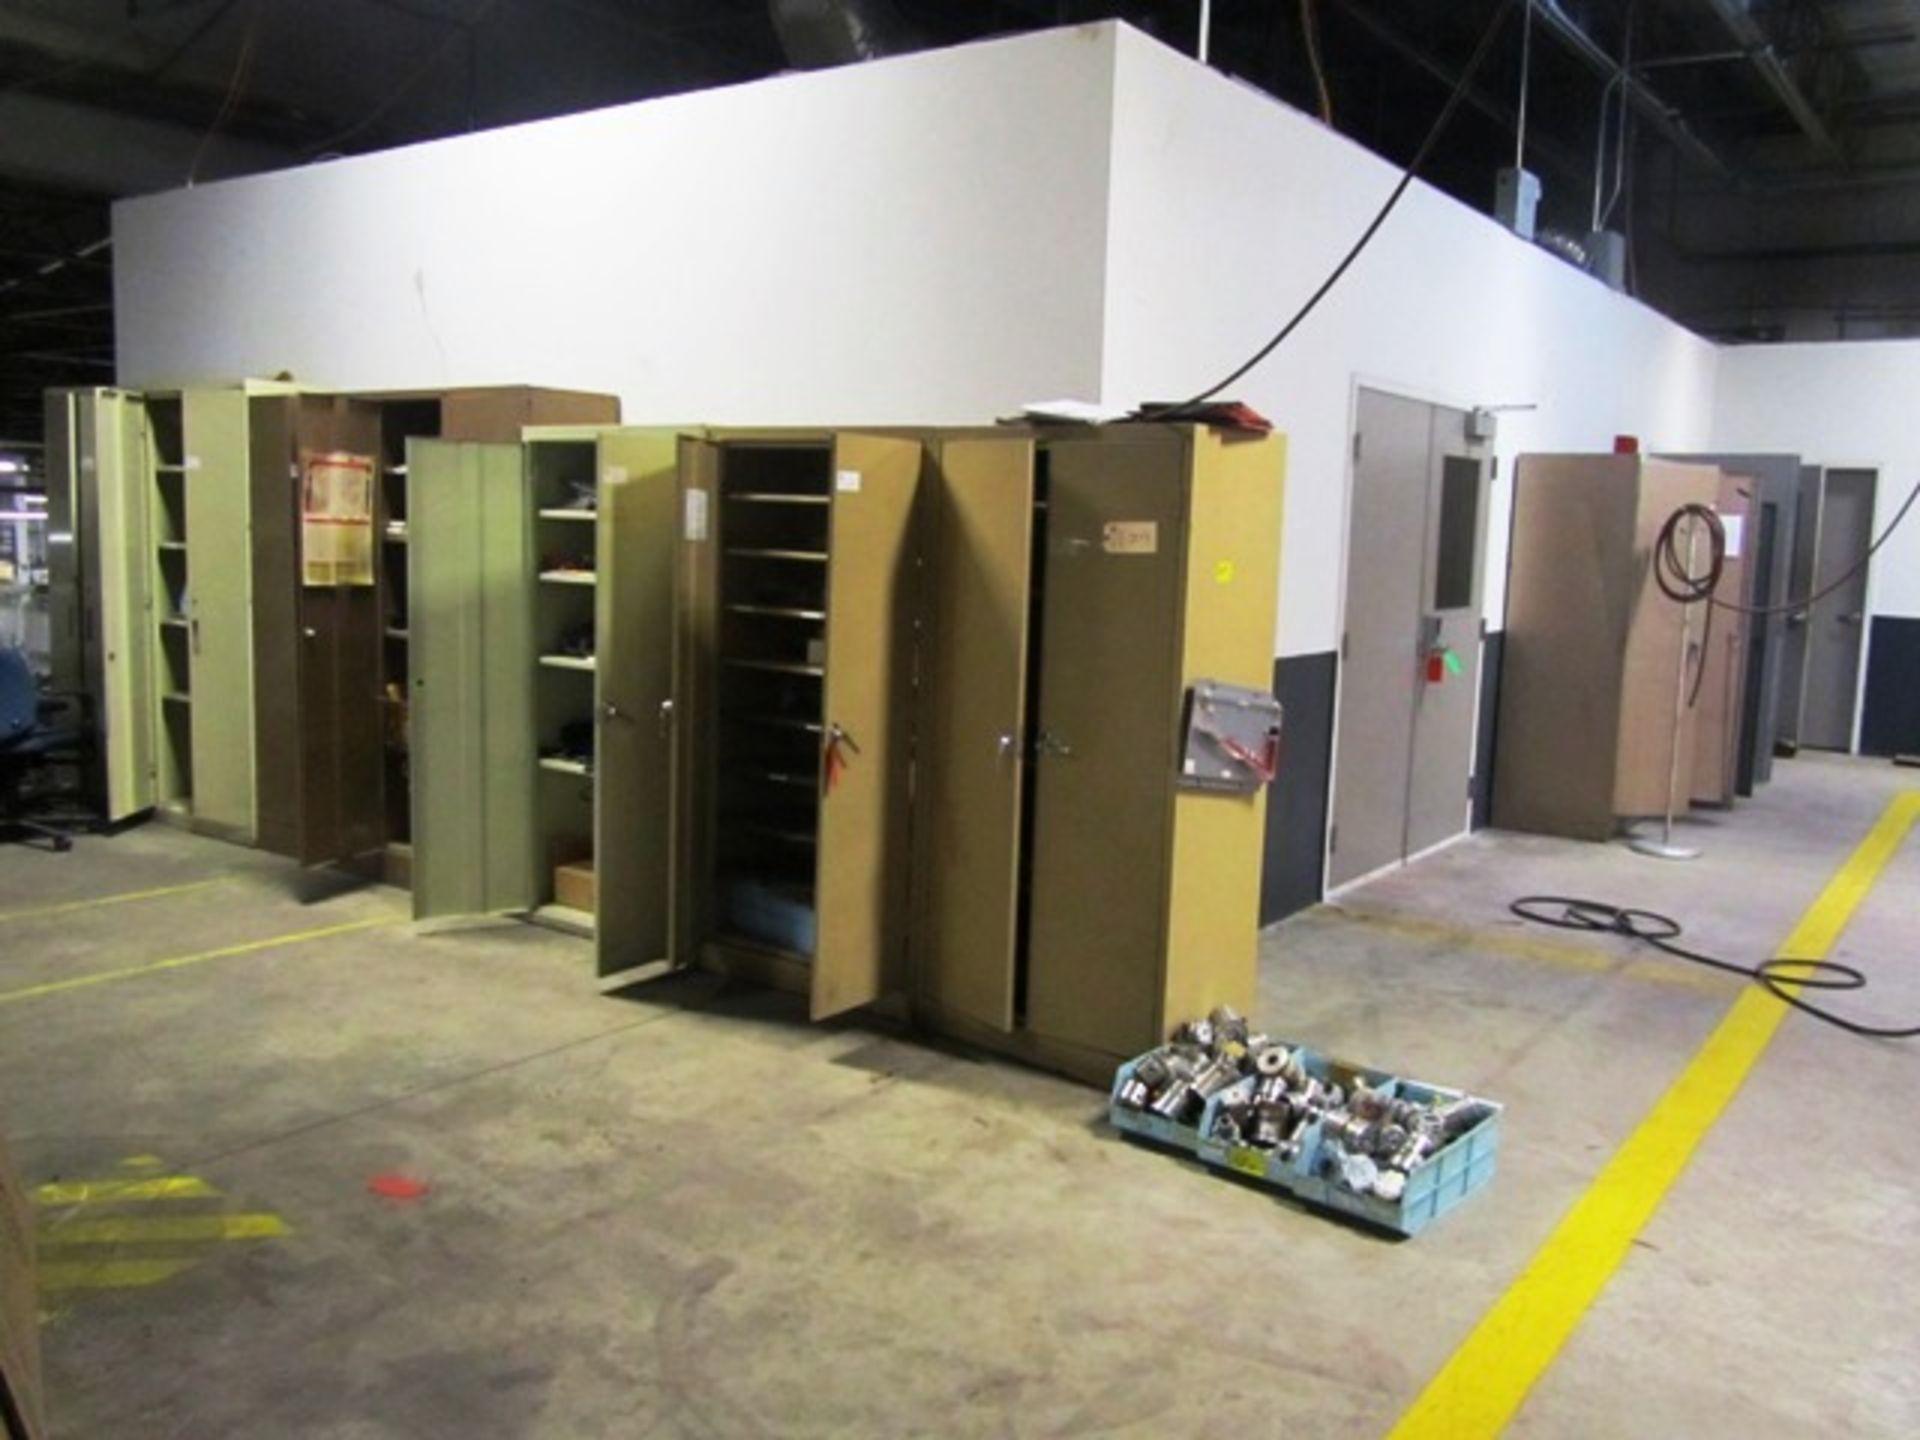 (10) 2 Door Cabinets with Lab Equipment